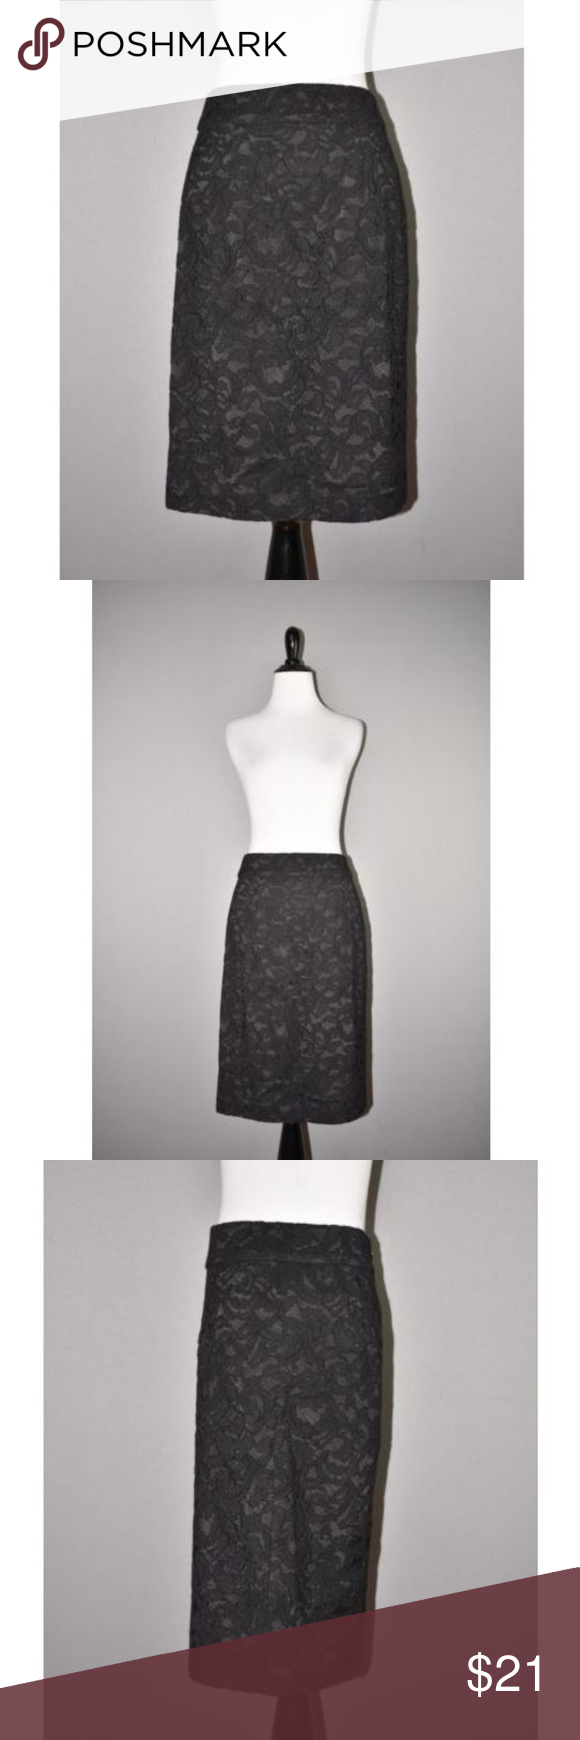 88b786505e BANANA REPUBLIC Lace Knee Length Pencil Skirt BANANA REPUBLIC NEW $70 Black  Lace Knee Length Pencil